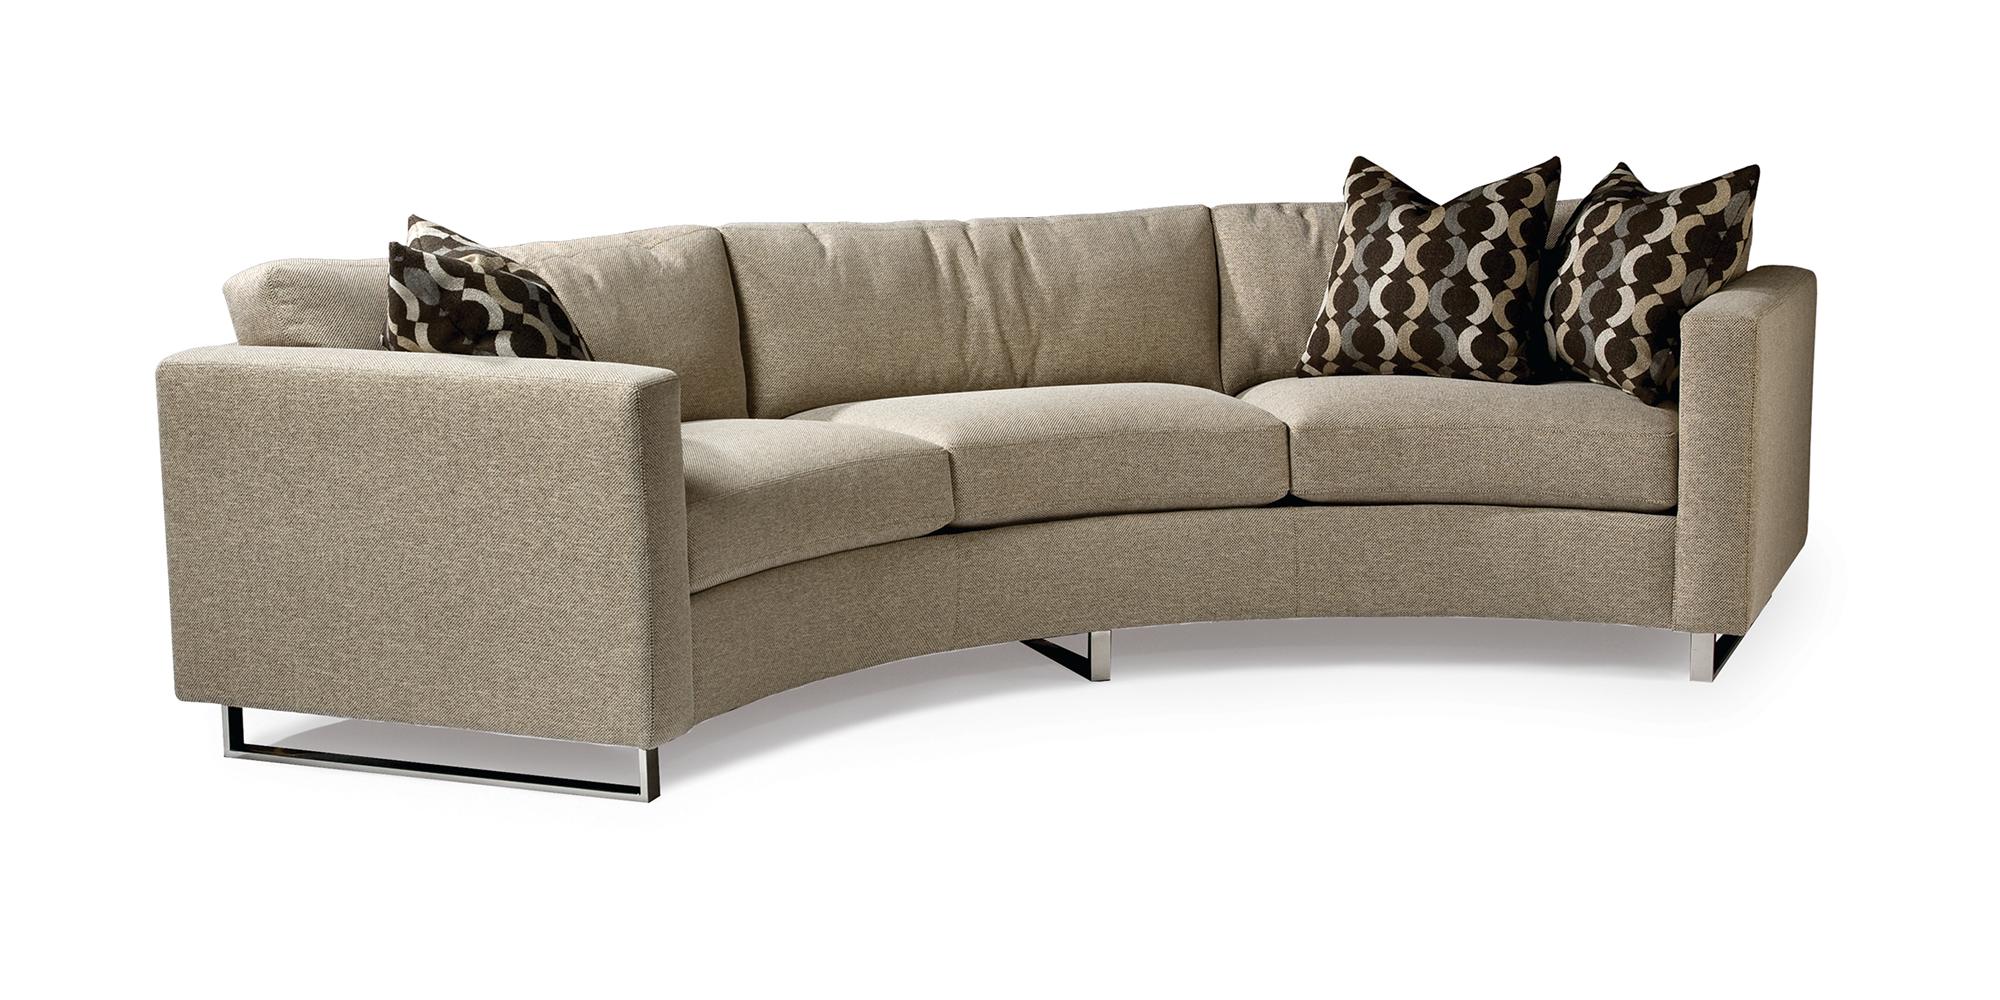 Milo Baughman Furniture From Thayer Coggin